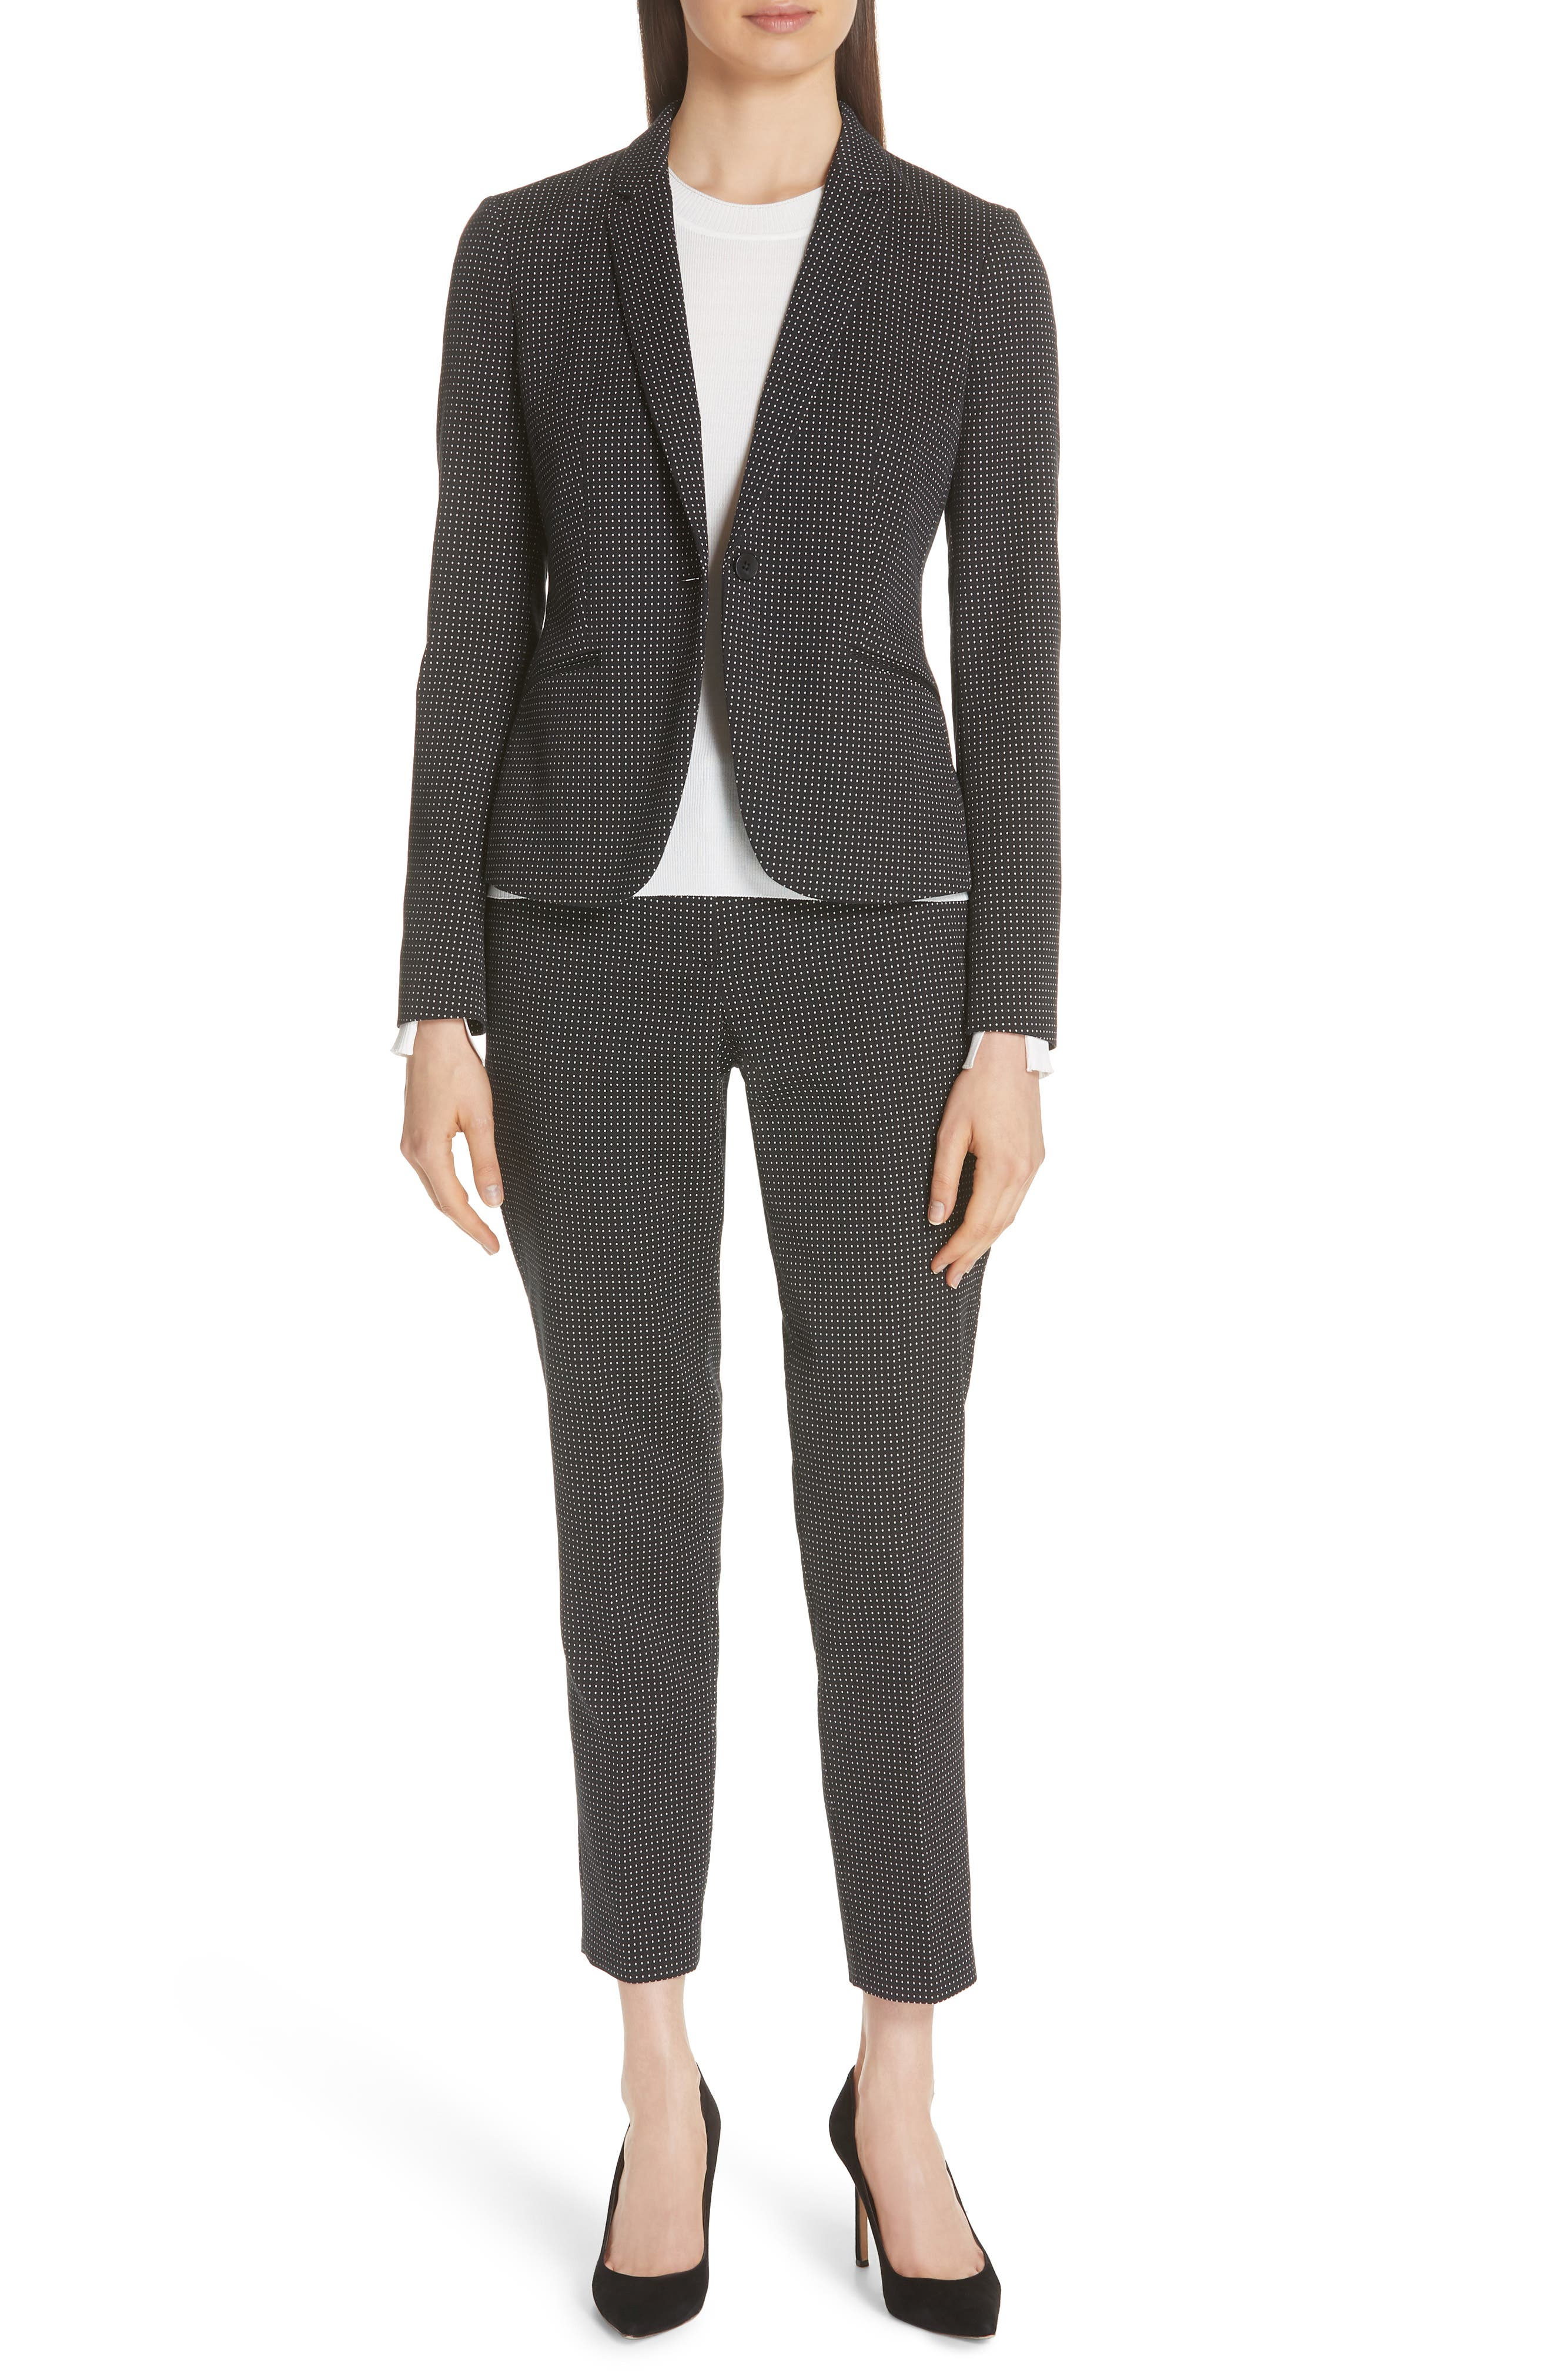 Tanitea Mini Dot Stretch Wool Suit Trousers,                             Alternate thumbnail 7, color,                             001